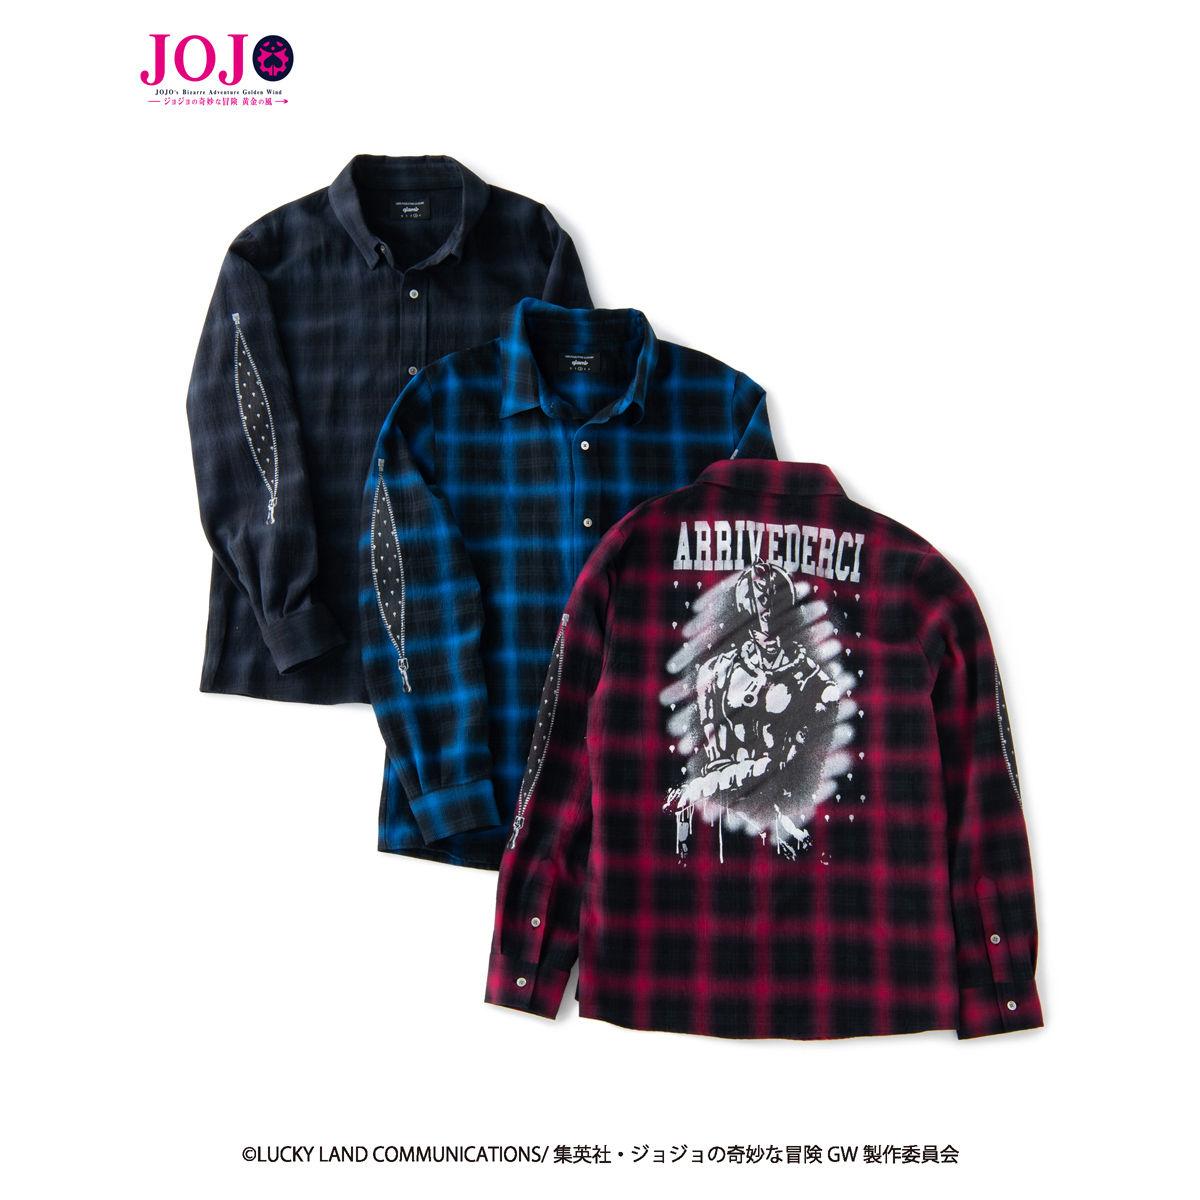 JoJo's Bizarre Adventure: Golden Wind  × glamb  collaboration Shirt